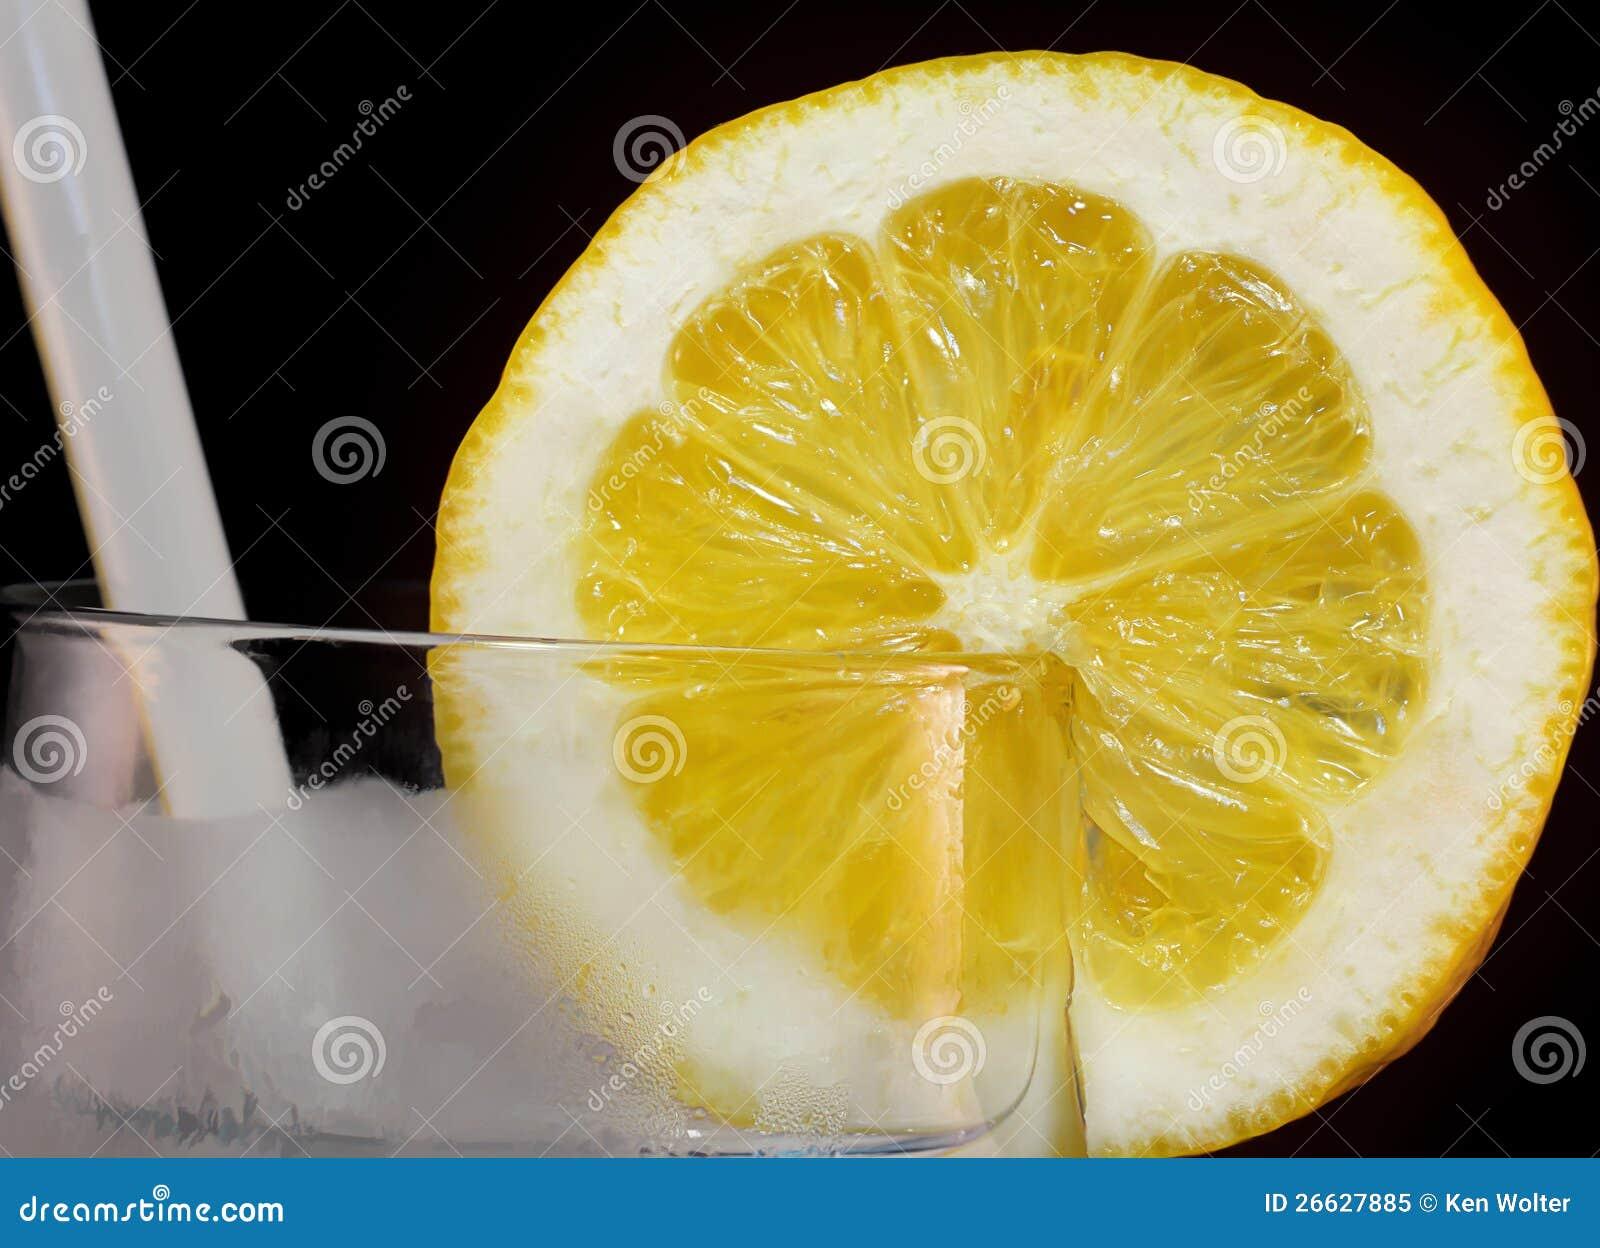 lemon slice in glass stock image image of eating cool 26627885